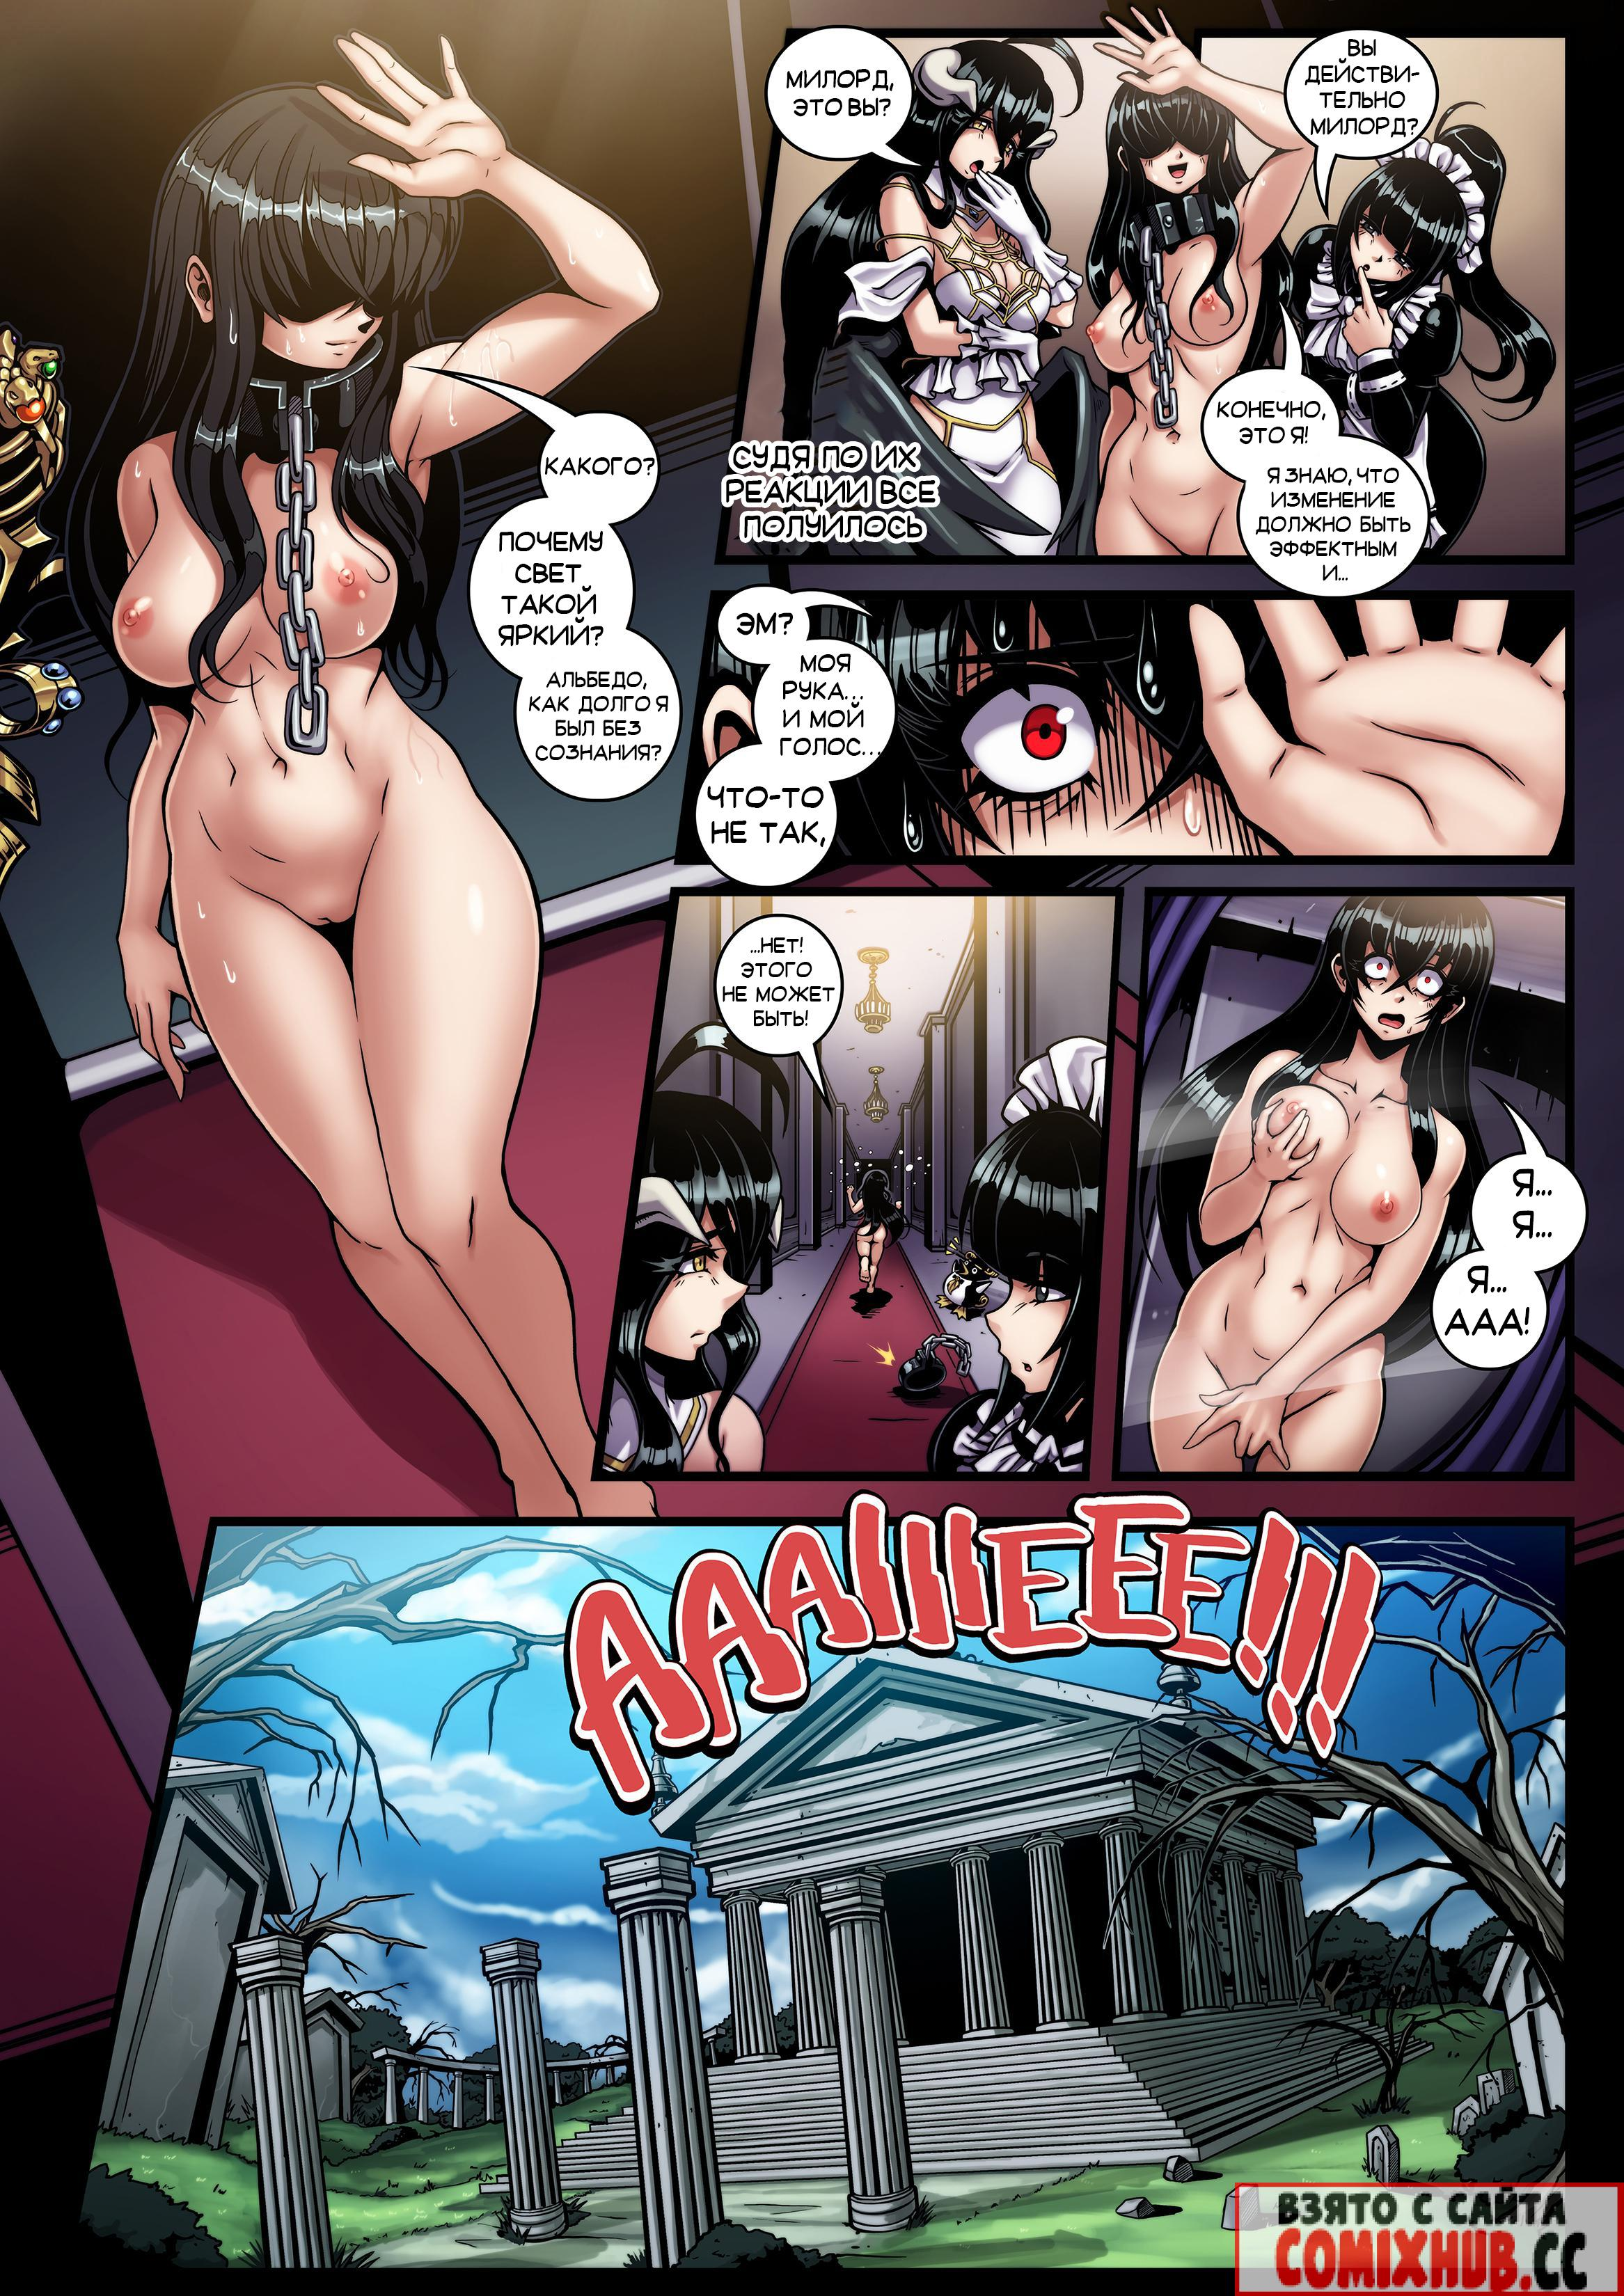 Порно комиксы — Оверлорд Без цензуры, Лесбиянки, Мастурбация, Супер-герои,